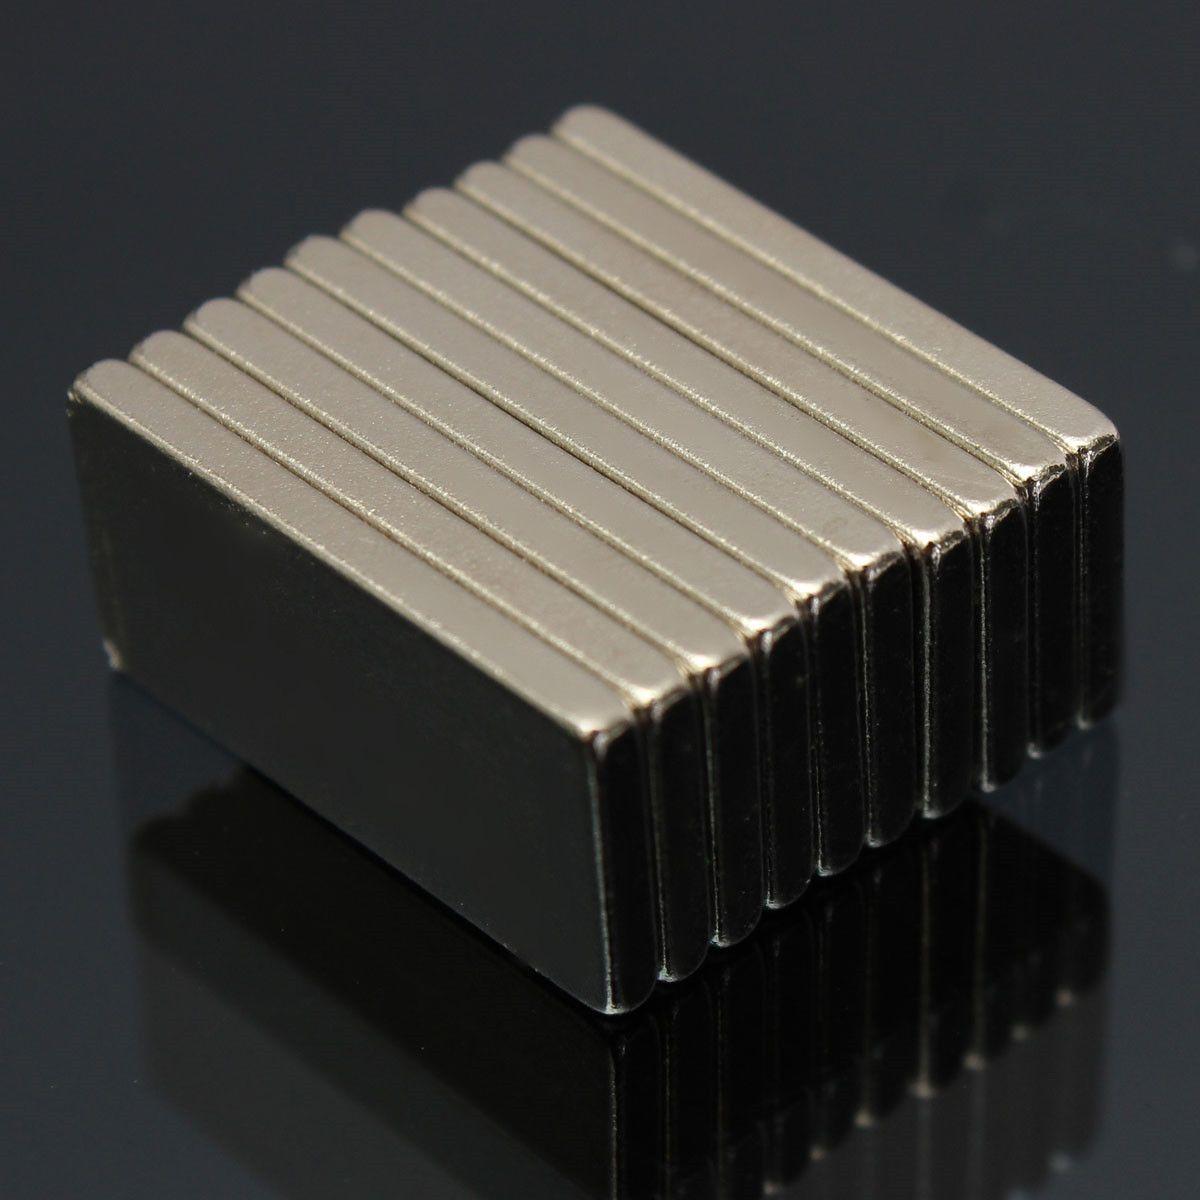 N52 20x10x2mm Block Magnets Rare Earth Neodymium Magnets